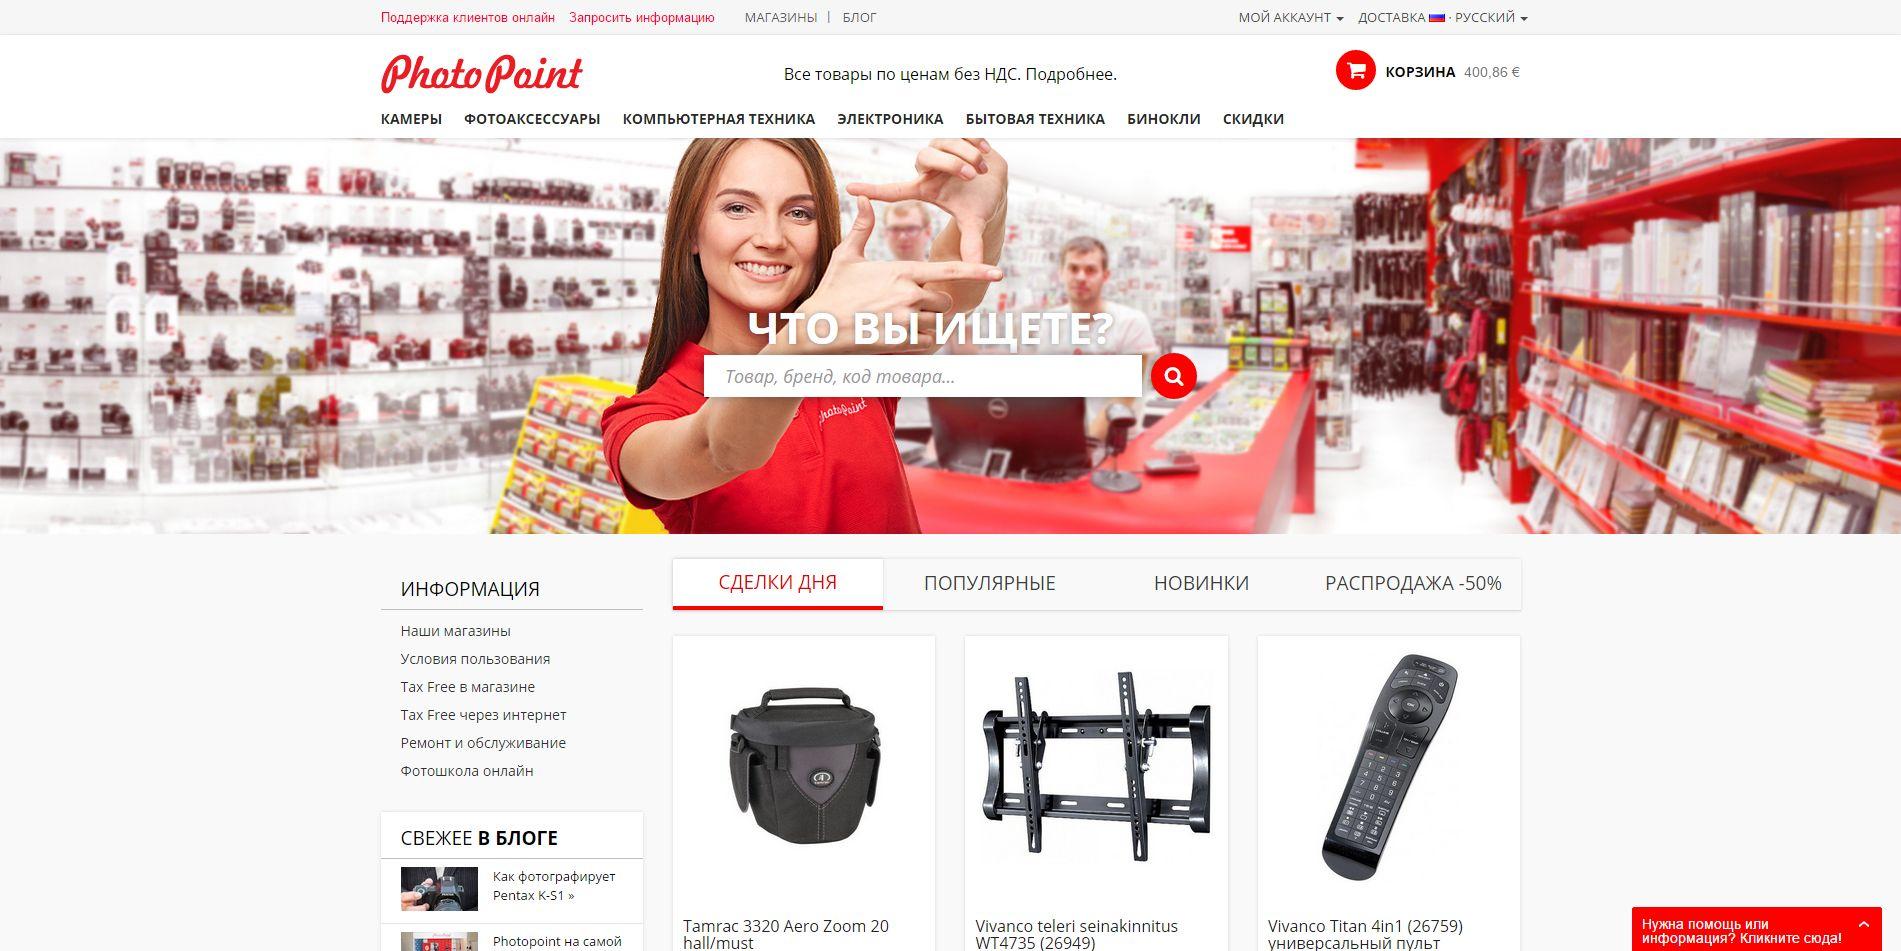 Начал работу веб-магазин Photopoint.RU